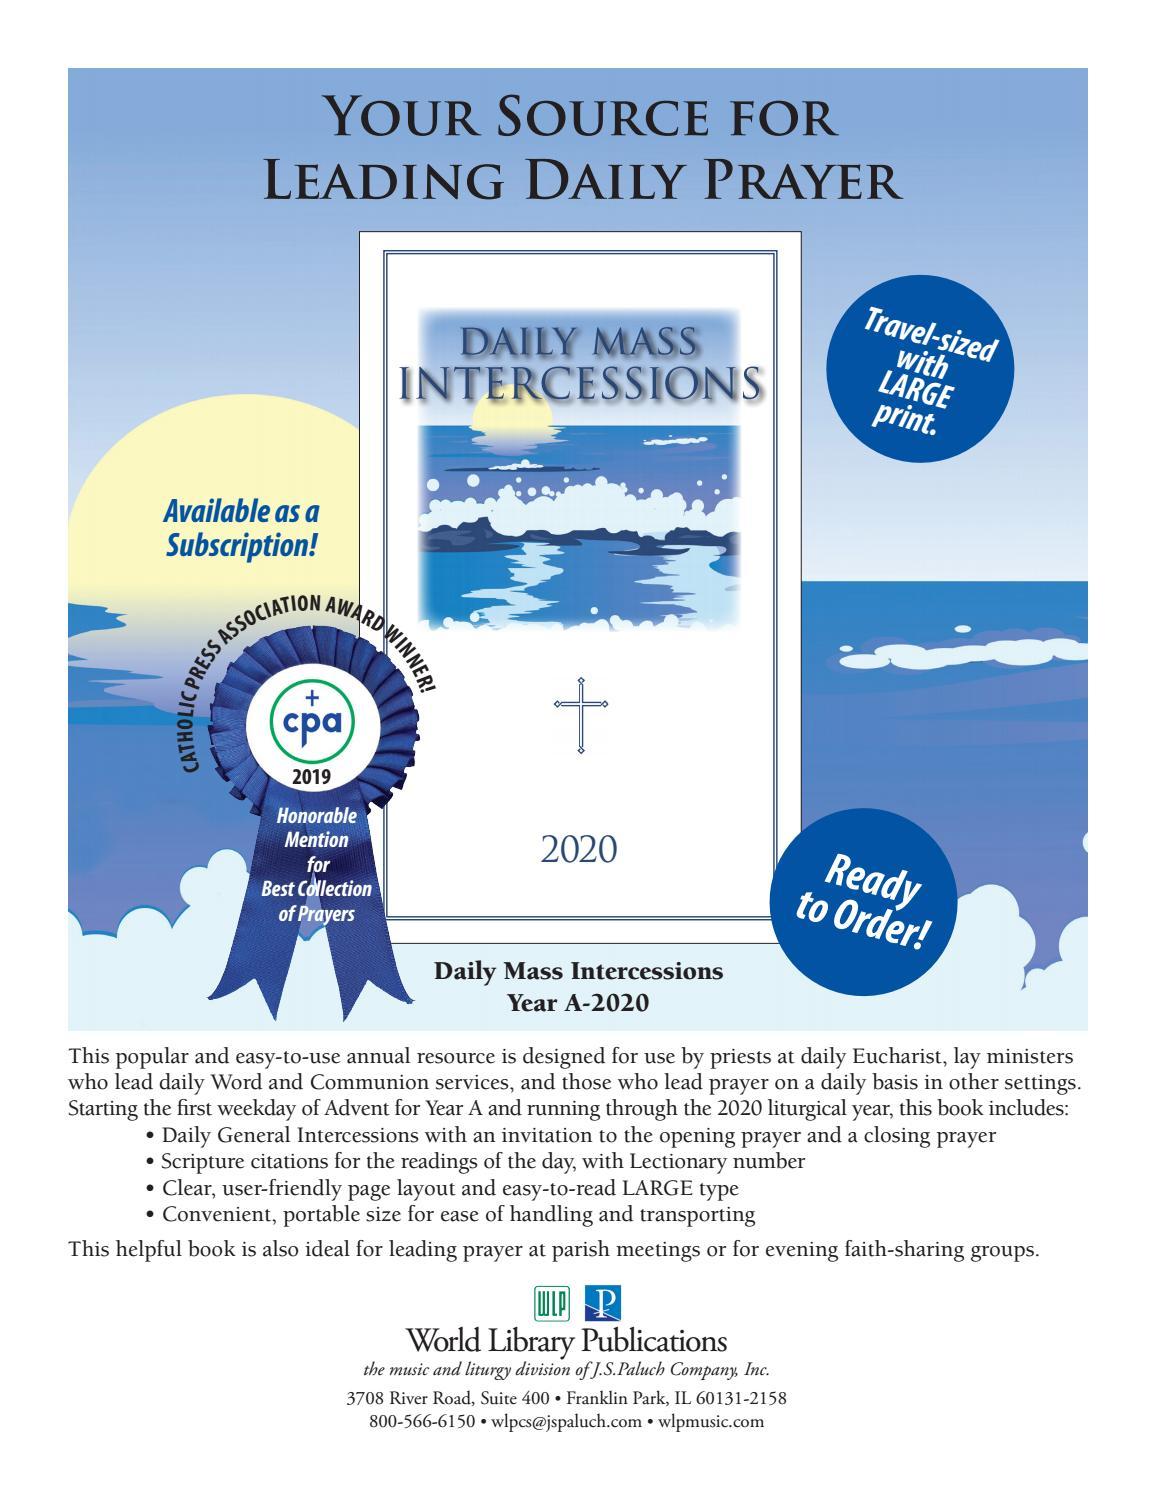 Daily Mass Intercessions 2021